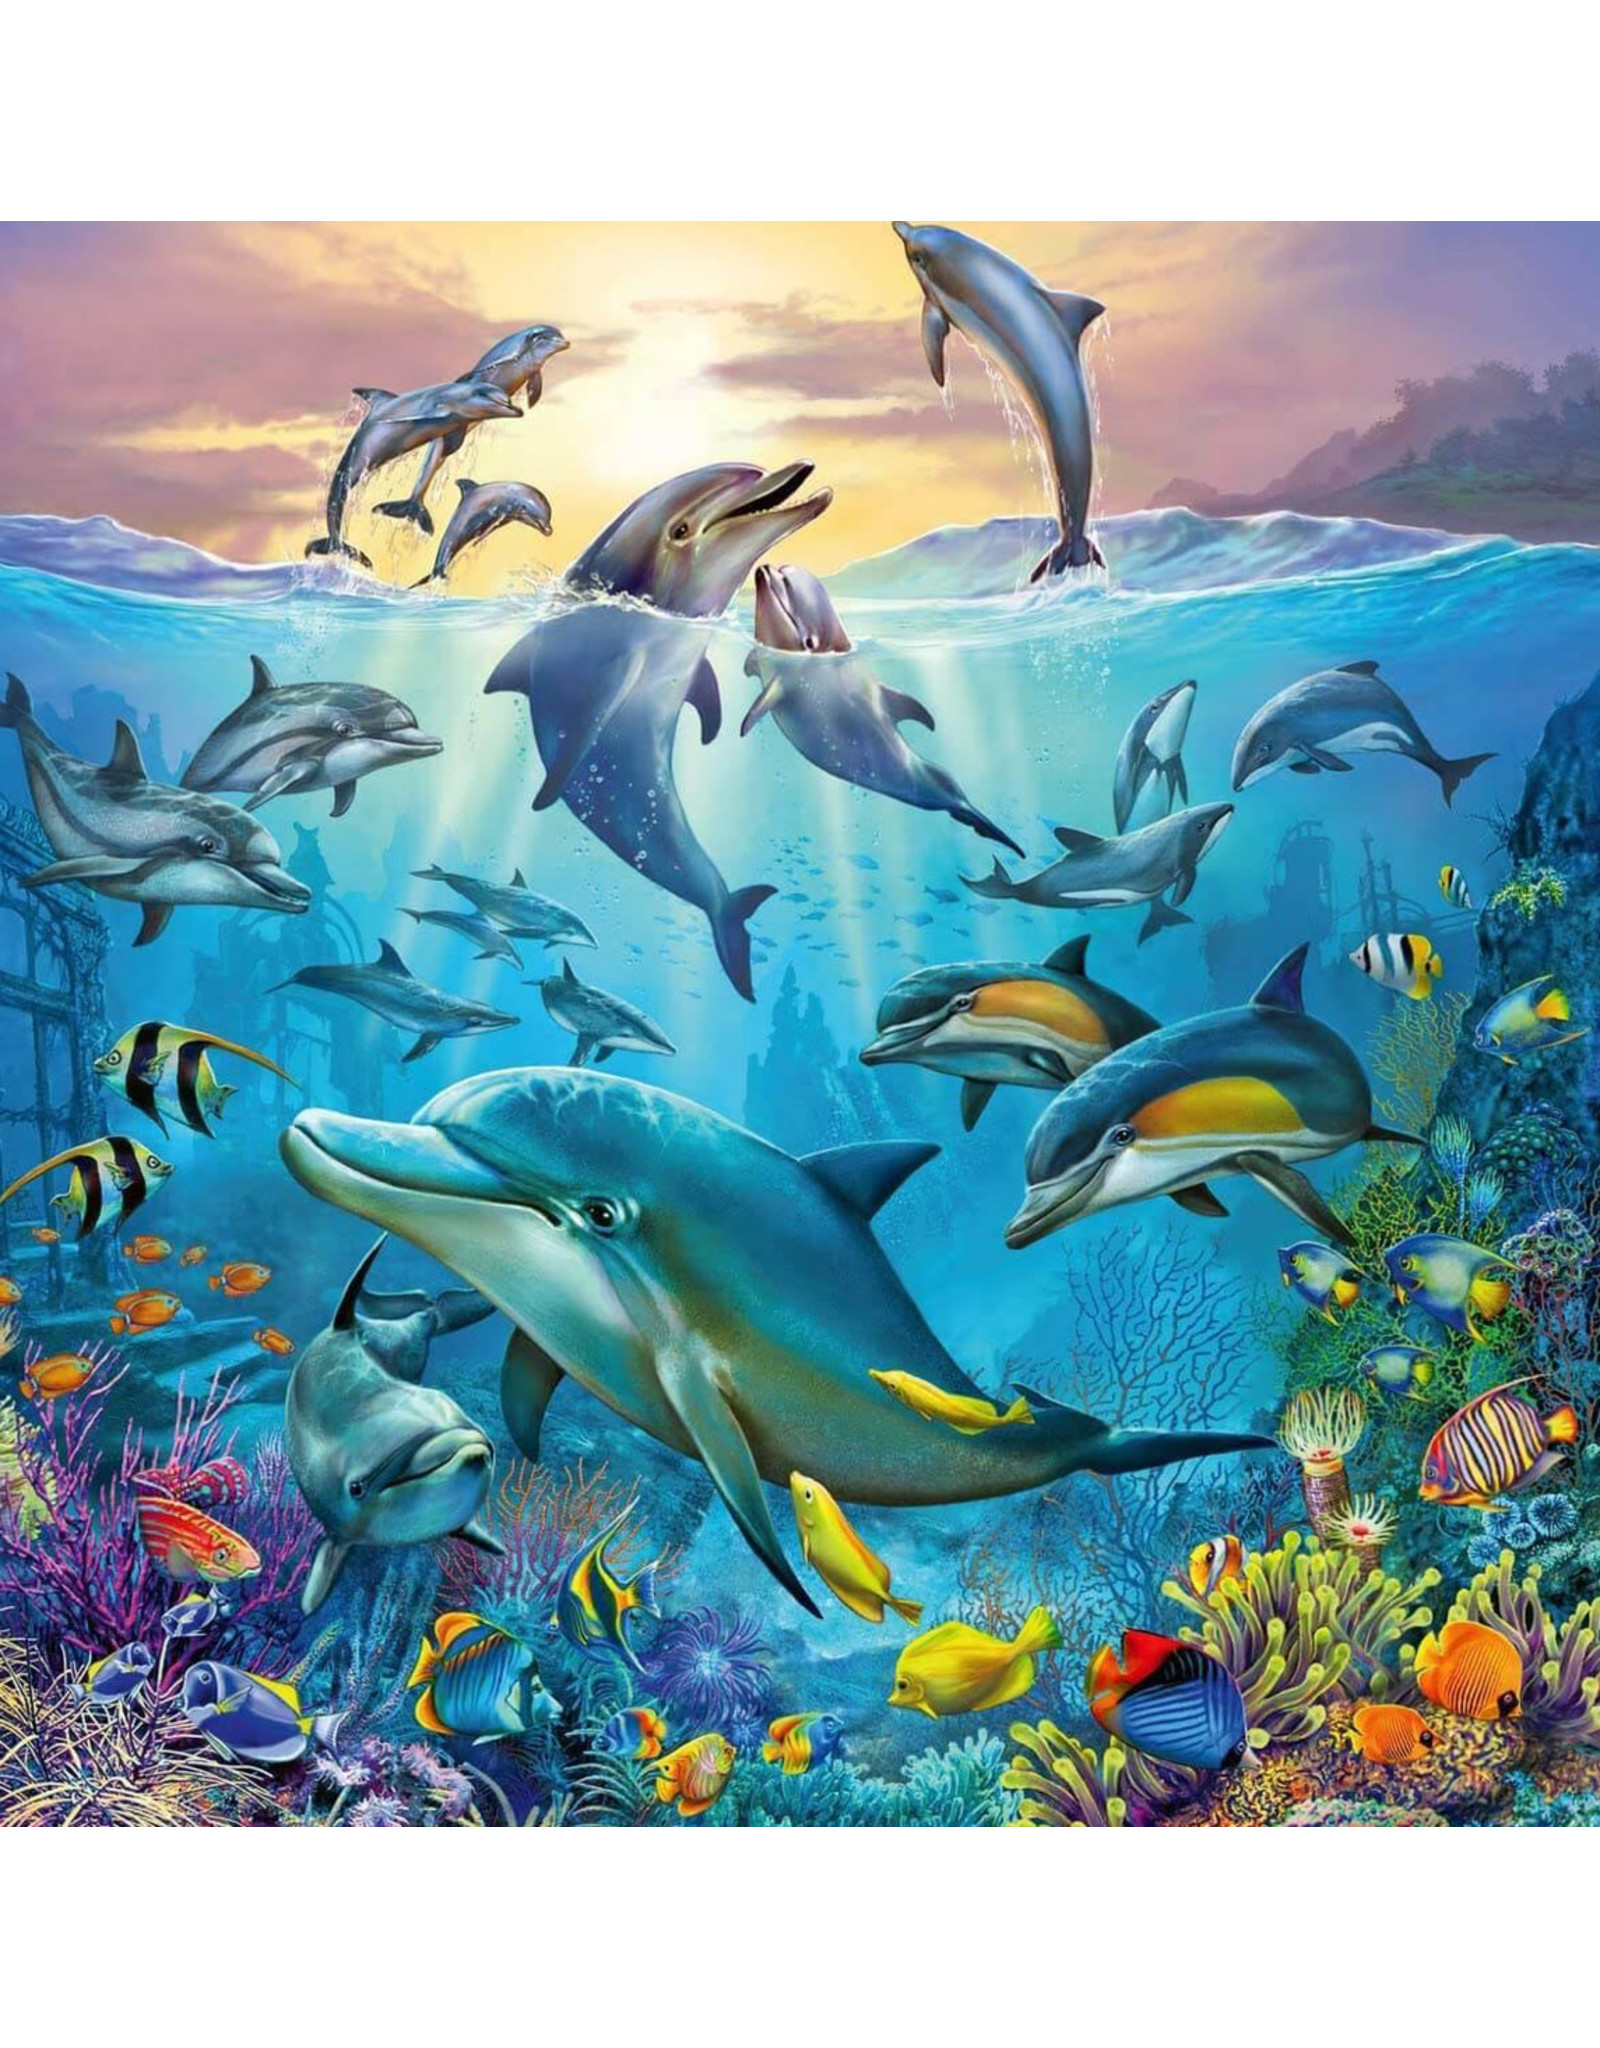 Ravensburger Ocean Life Puzzle 3x49pc Puzzles